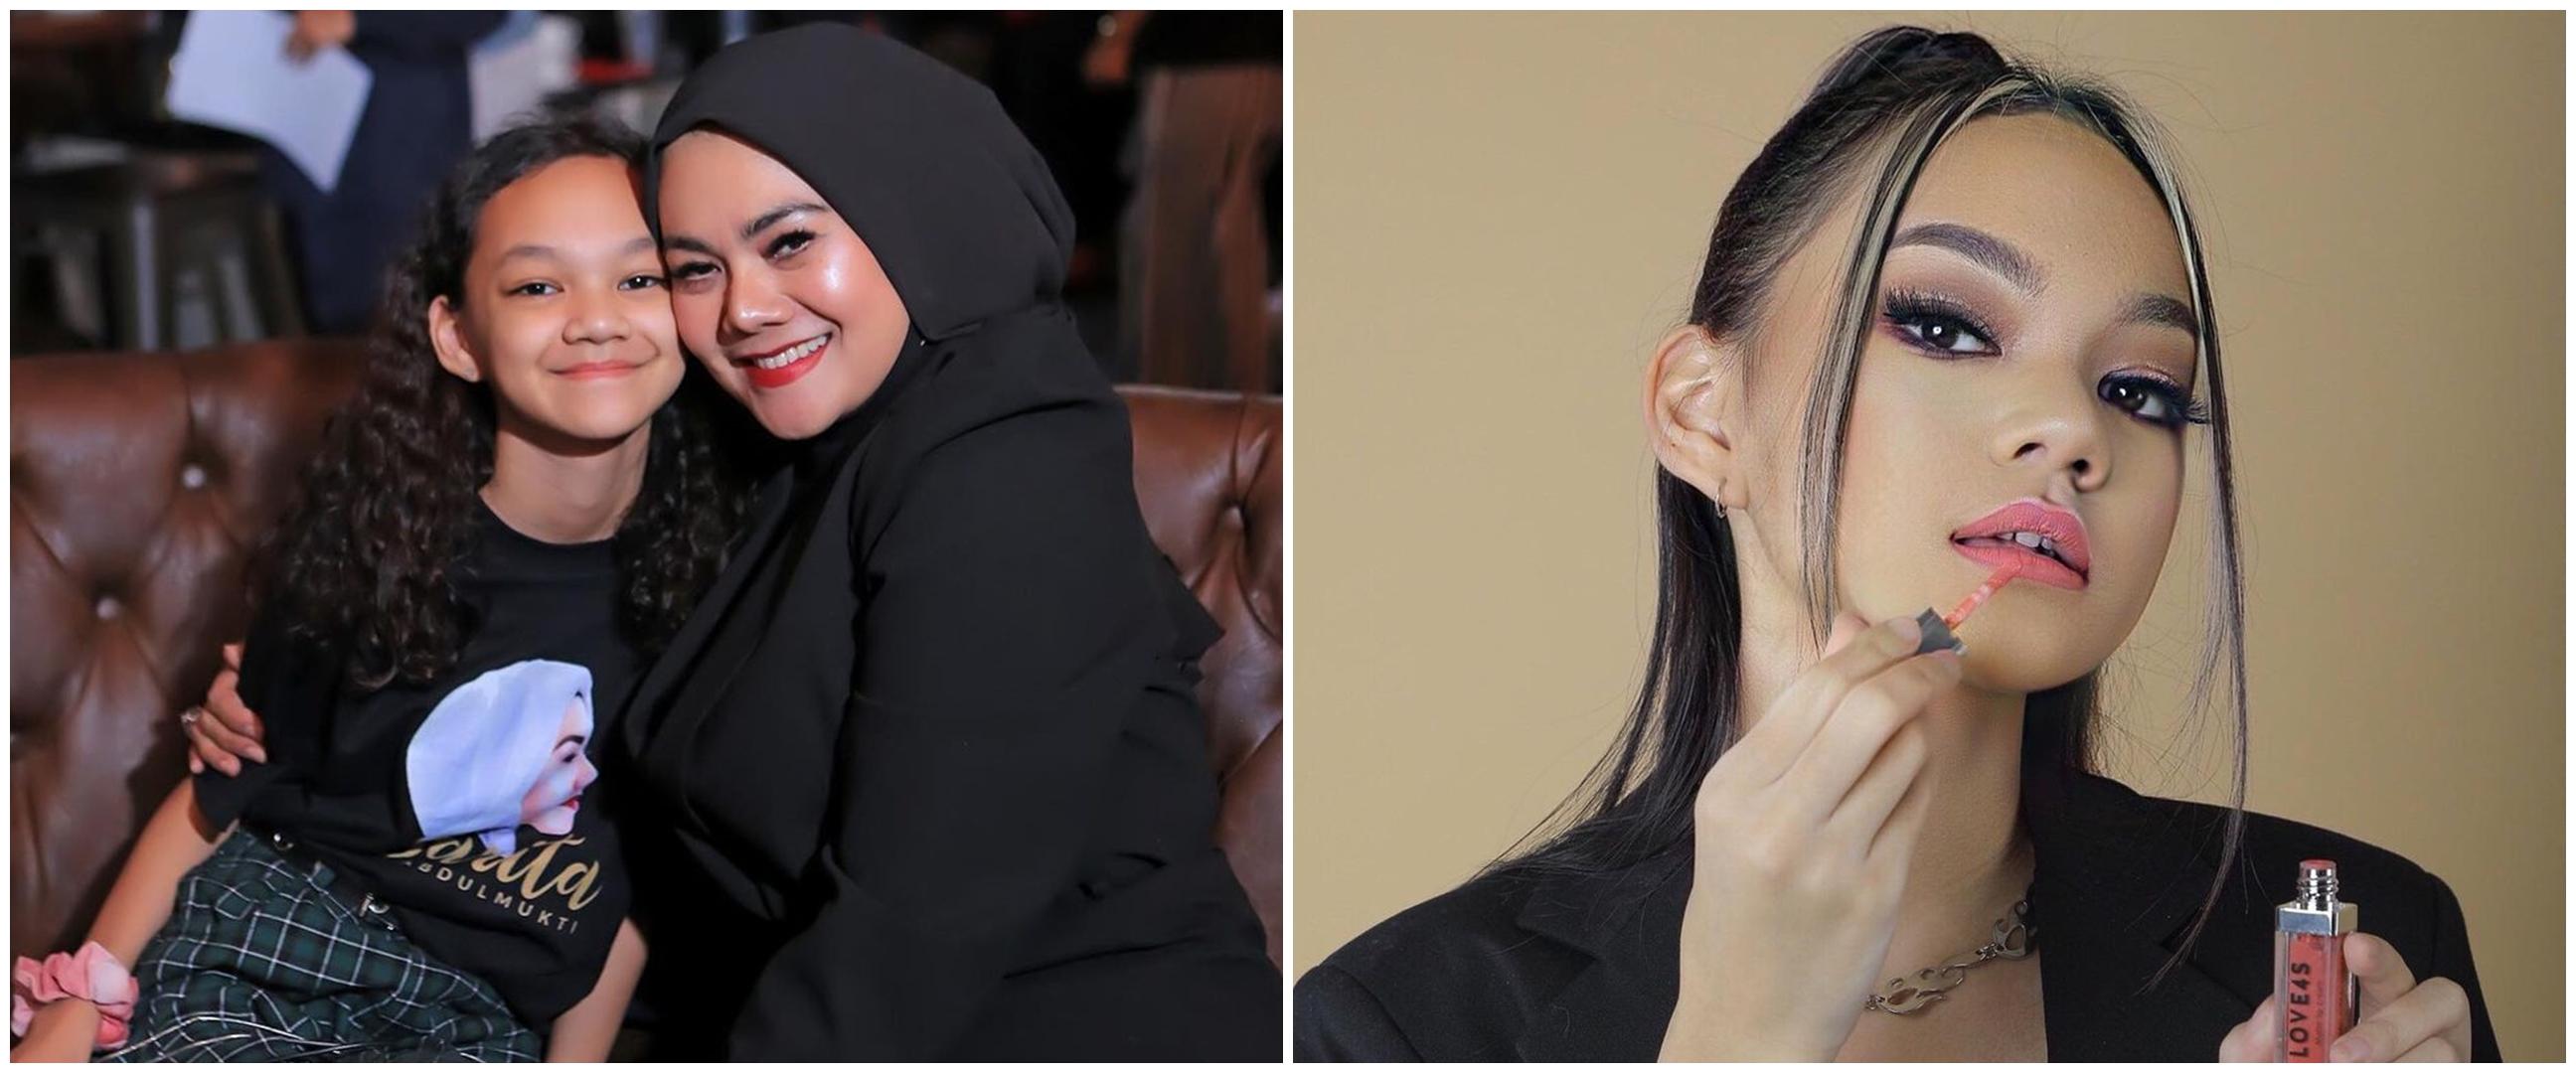 10 Pesona Shabina Mecca, bungsu Sarita Abdul Mukti yang sudah remaja